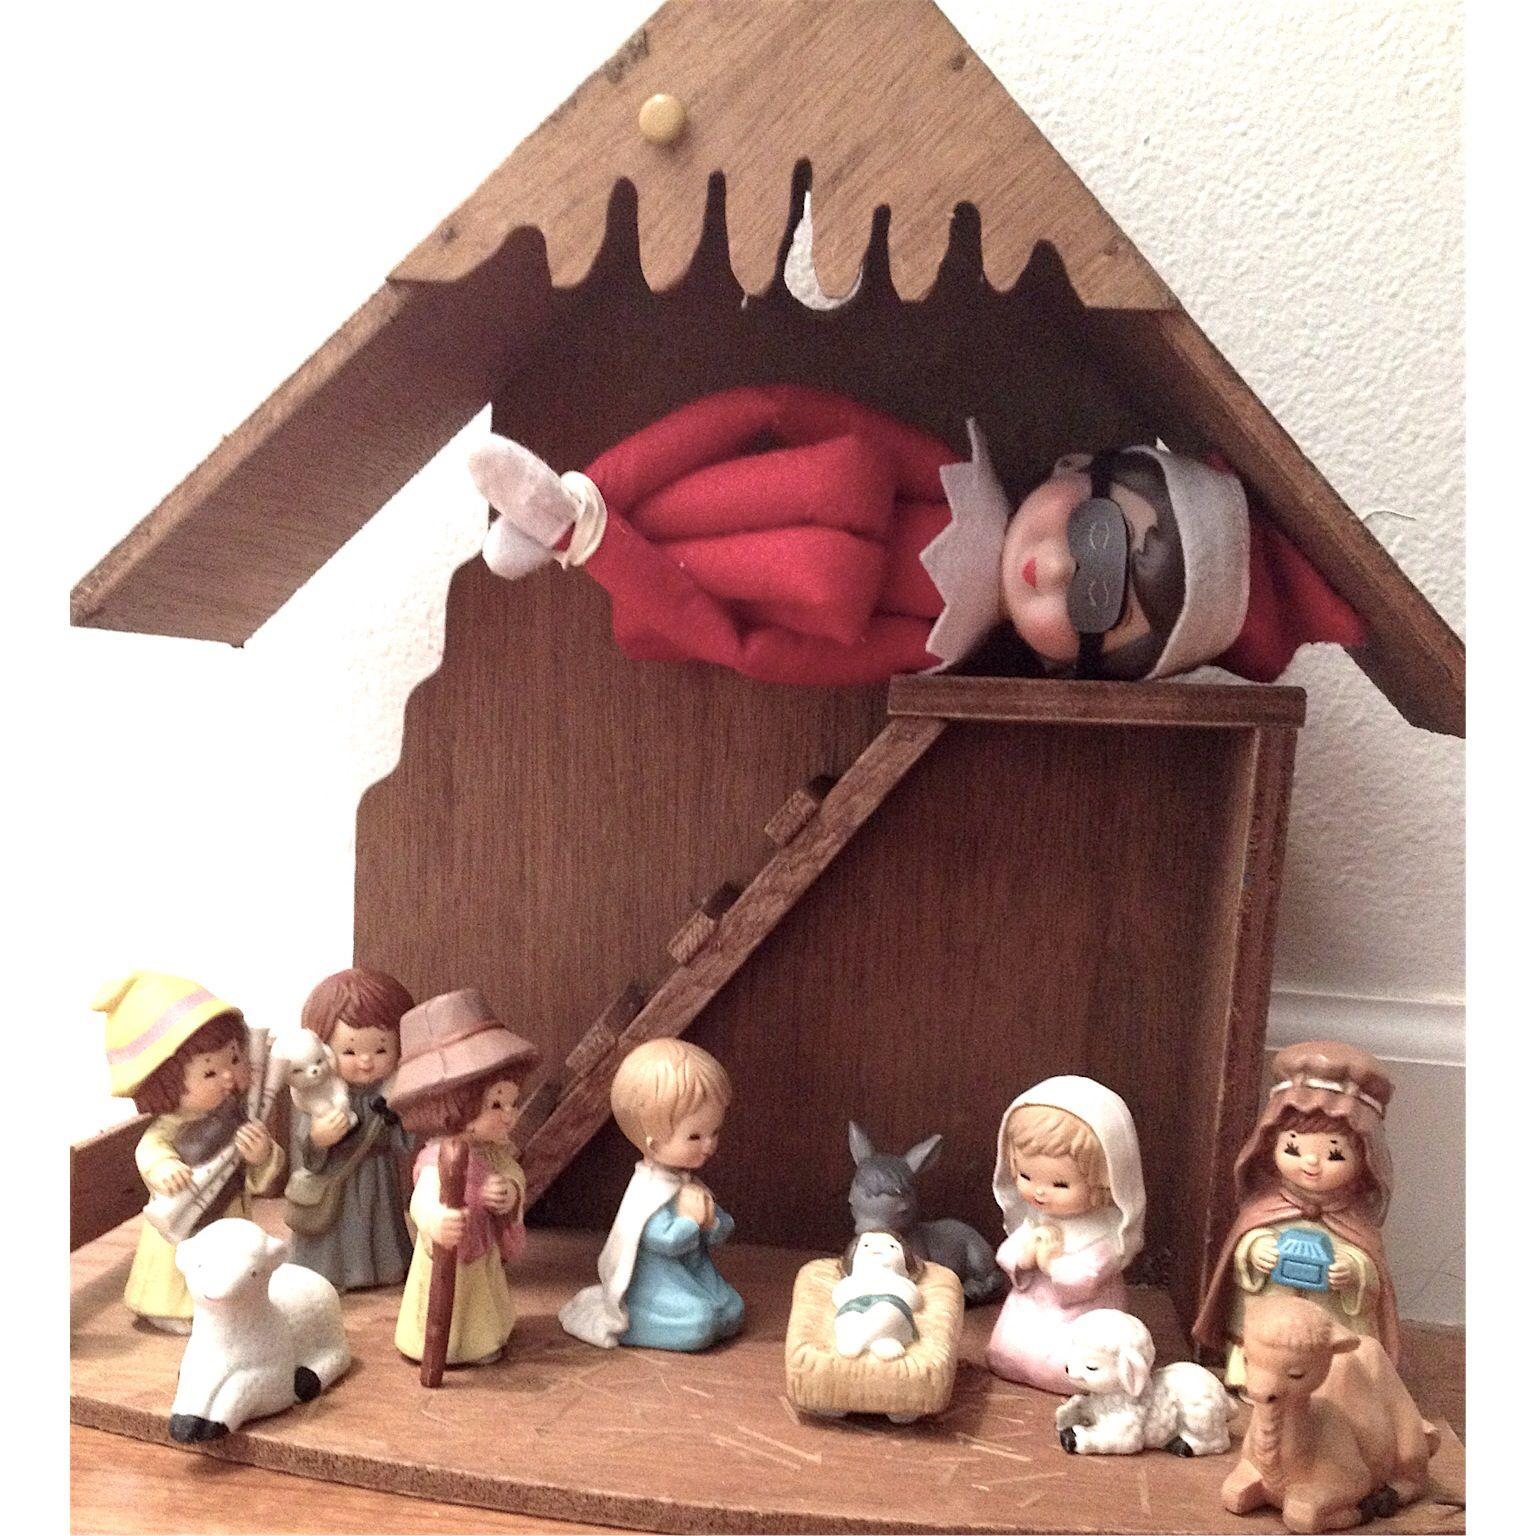 Elf sleeps by the Nativity